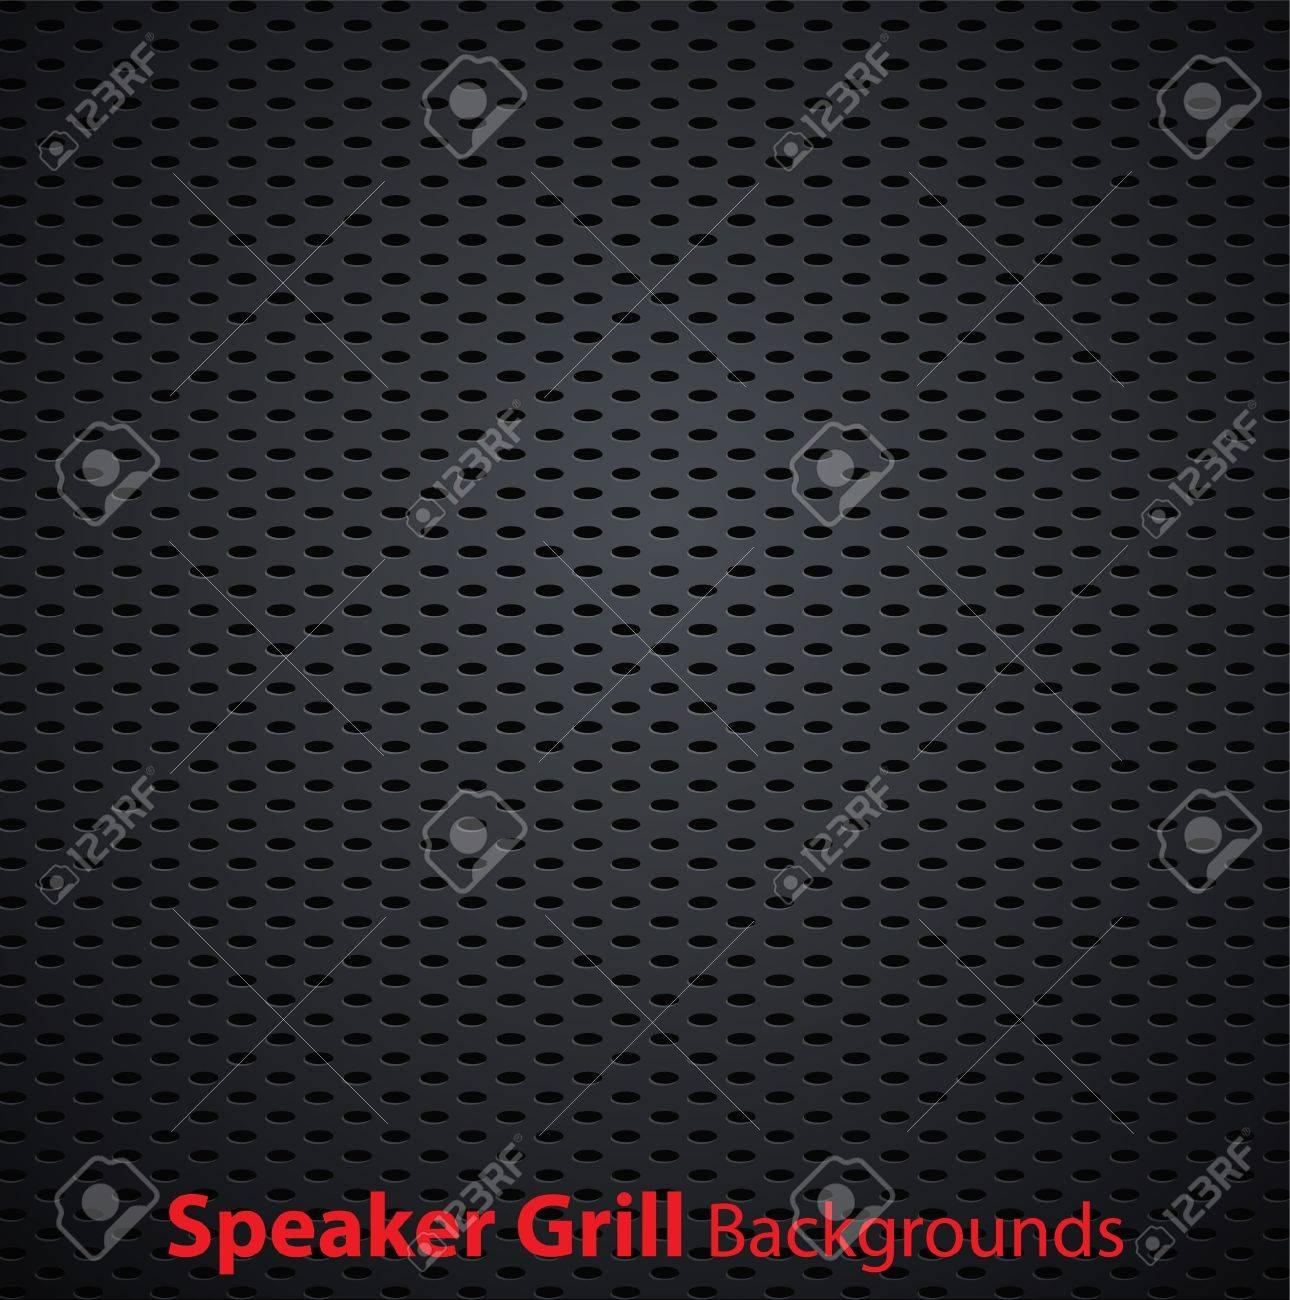 Realistic vector speaker grill background Stock Vector - 10661241